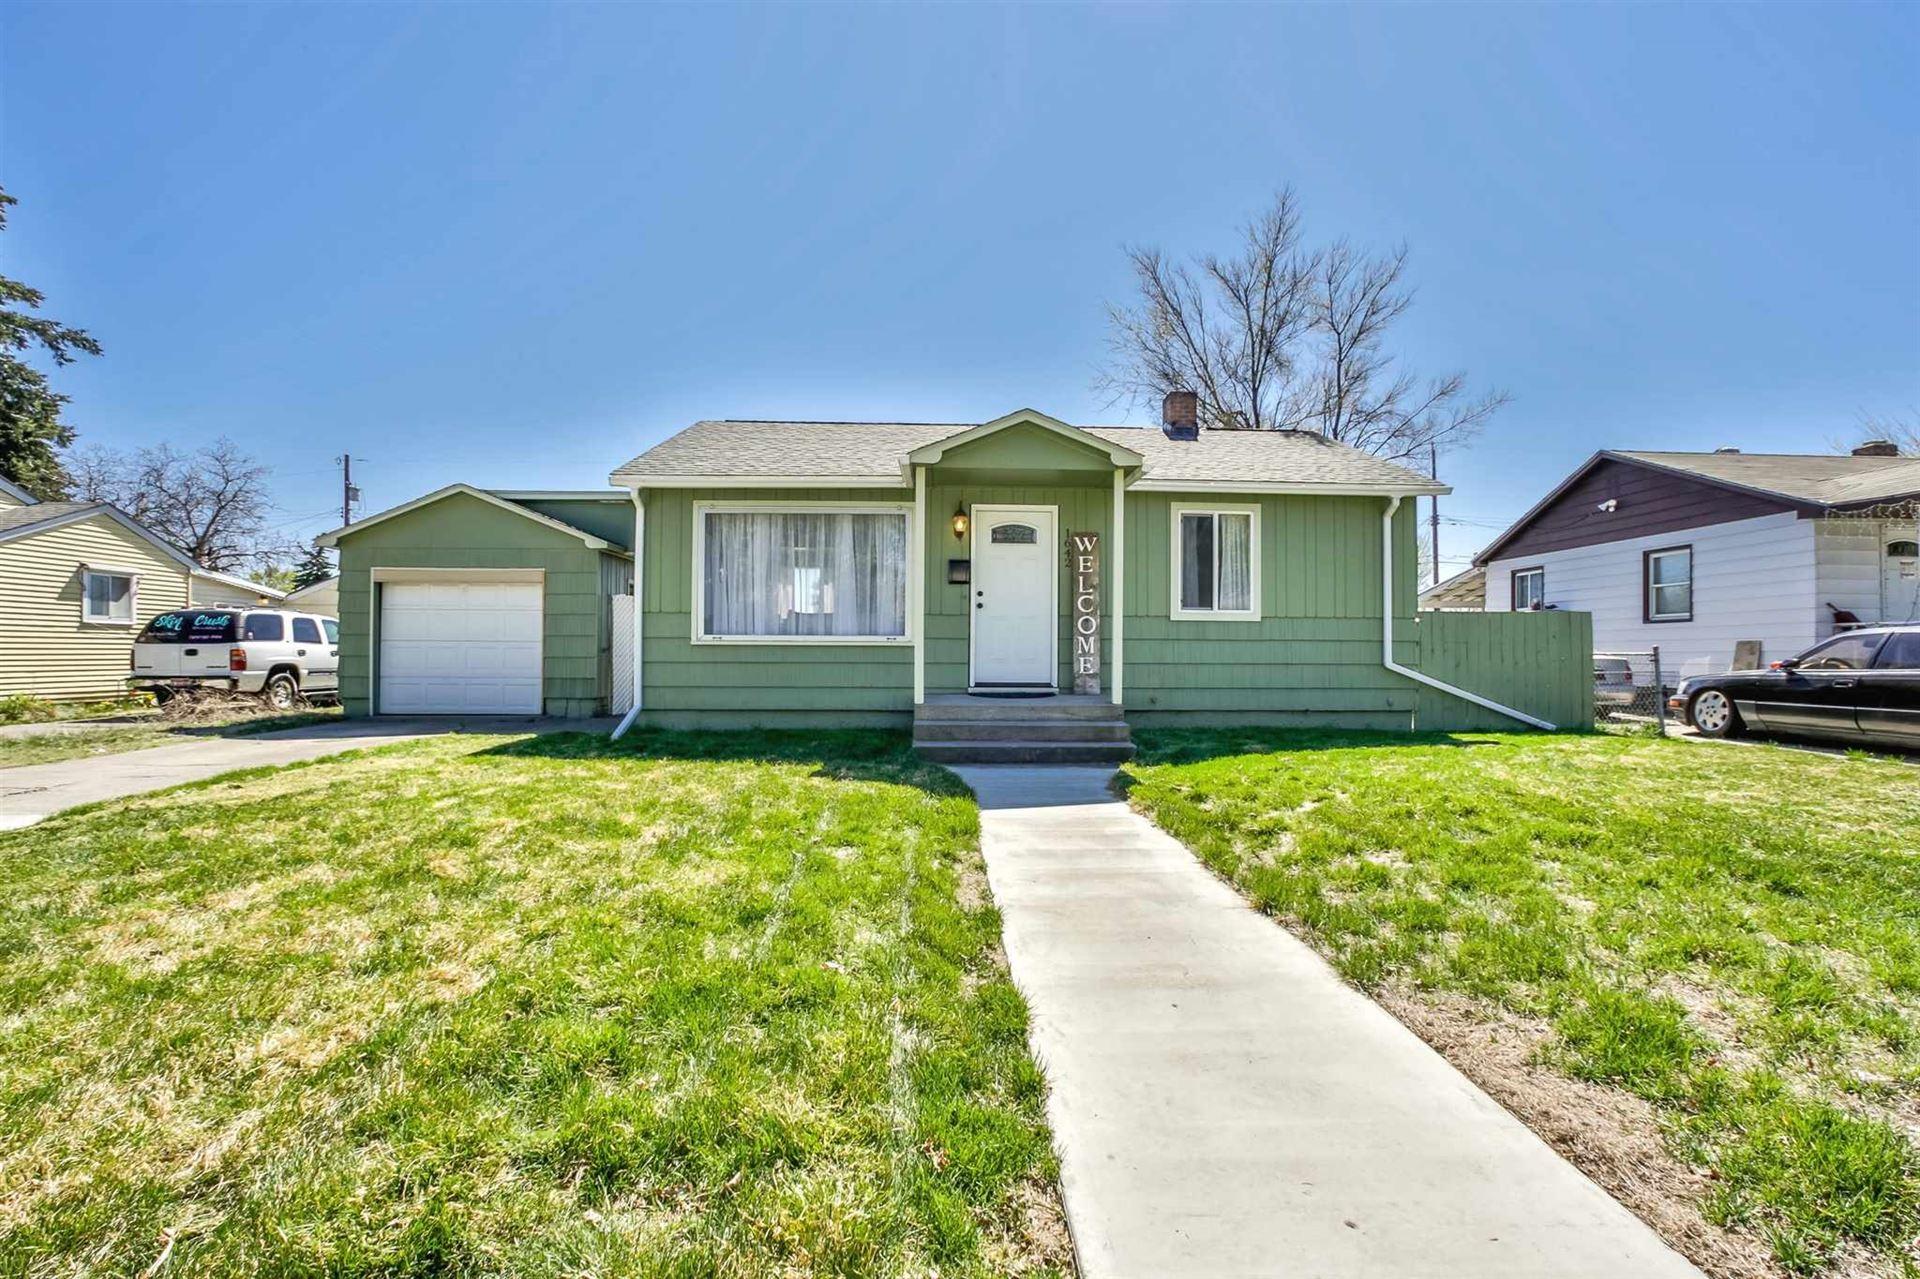 1642 E Bismark Ave, Spokane, WA 99208 - #: 202114248